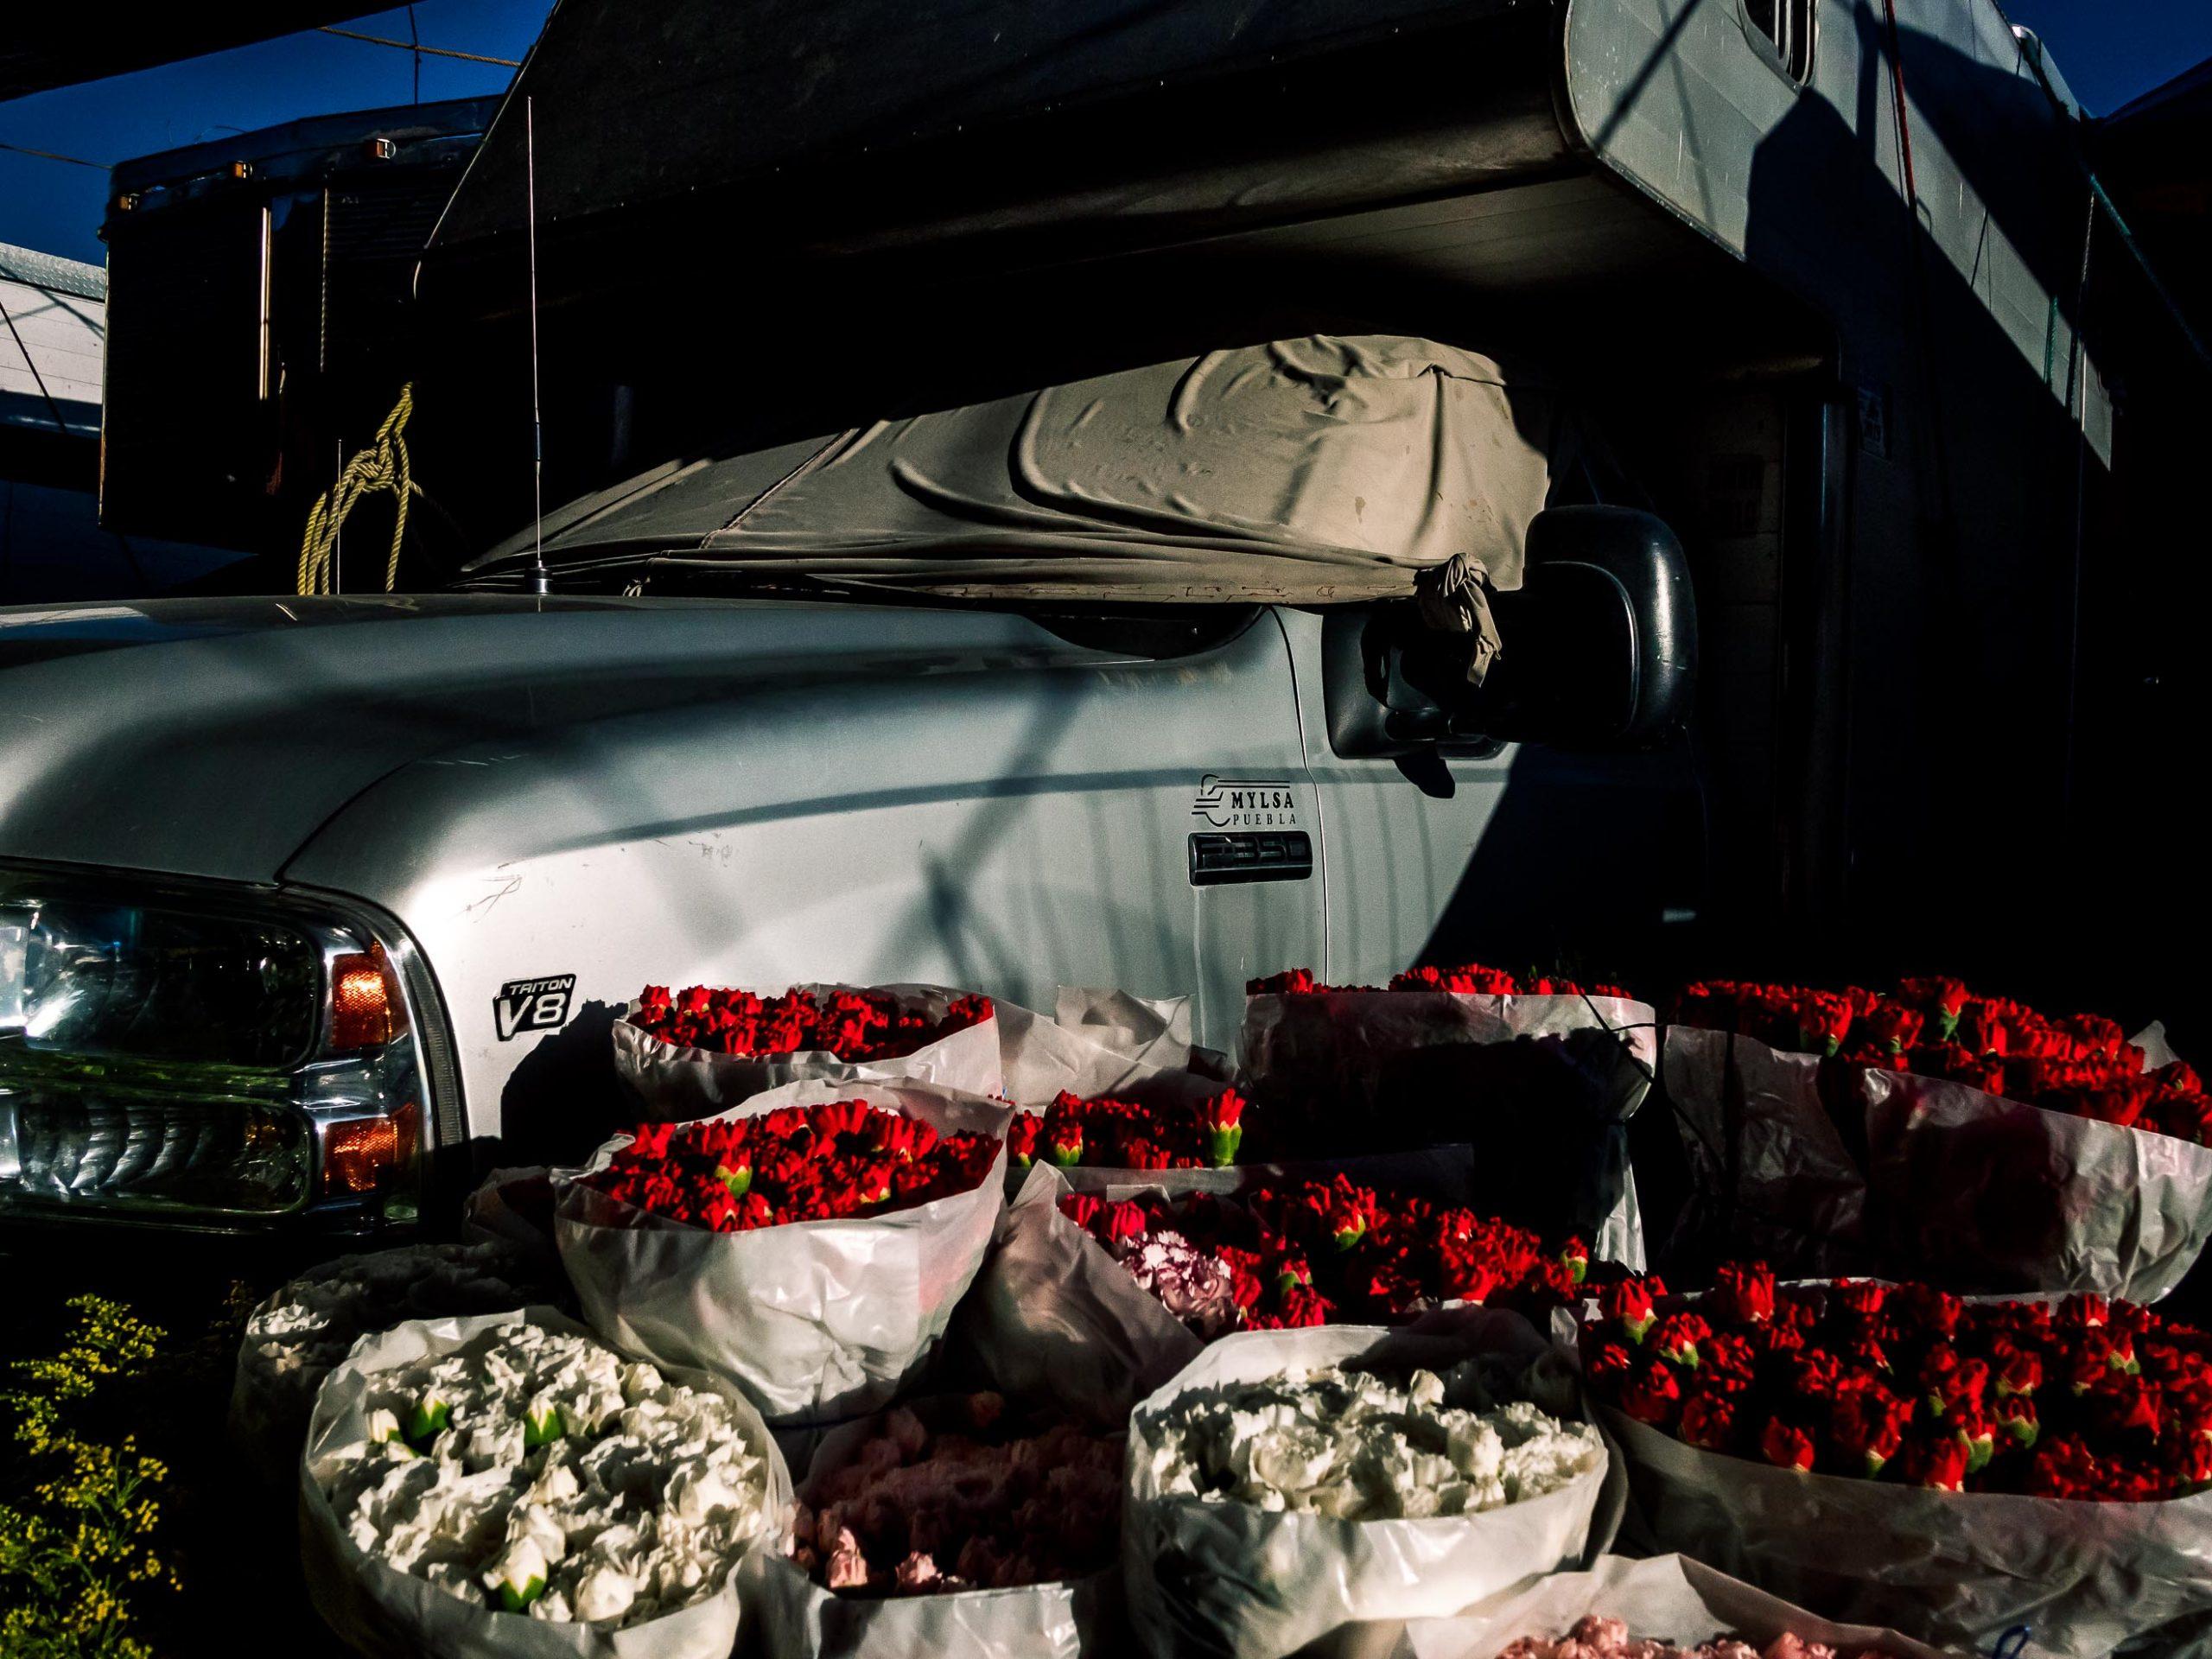 Gemüseangebot auf Mercado de Abasto in Oaxaca Mexiko